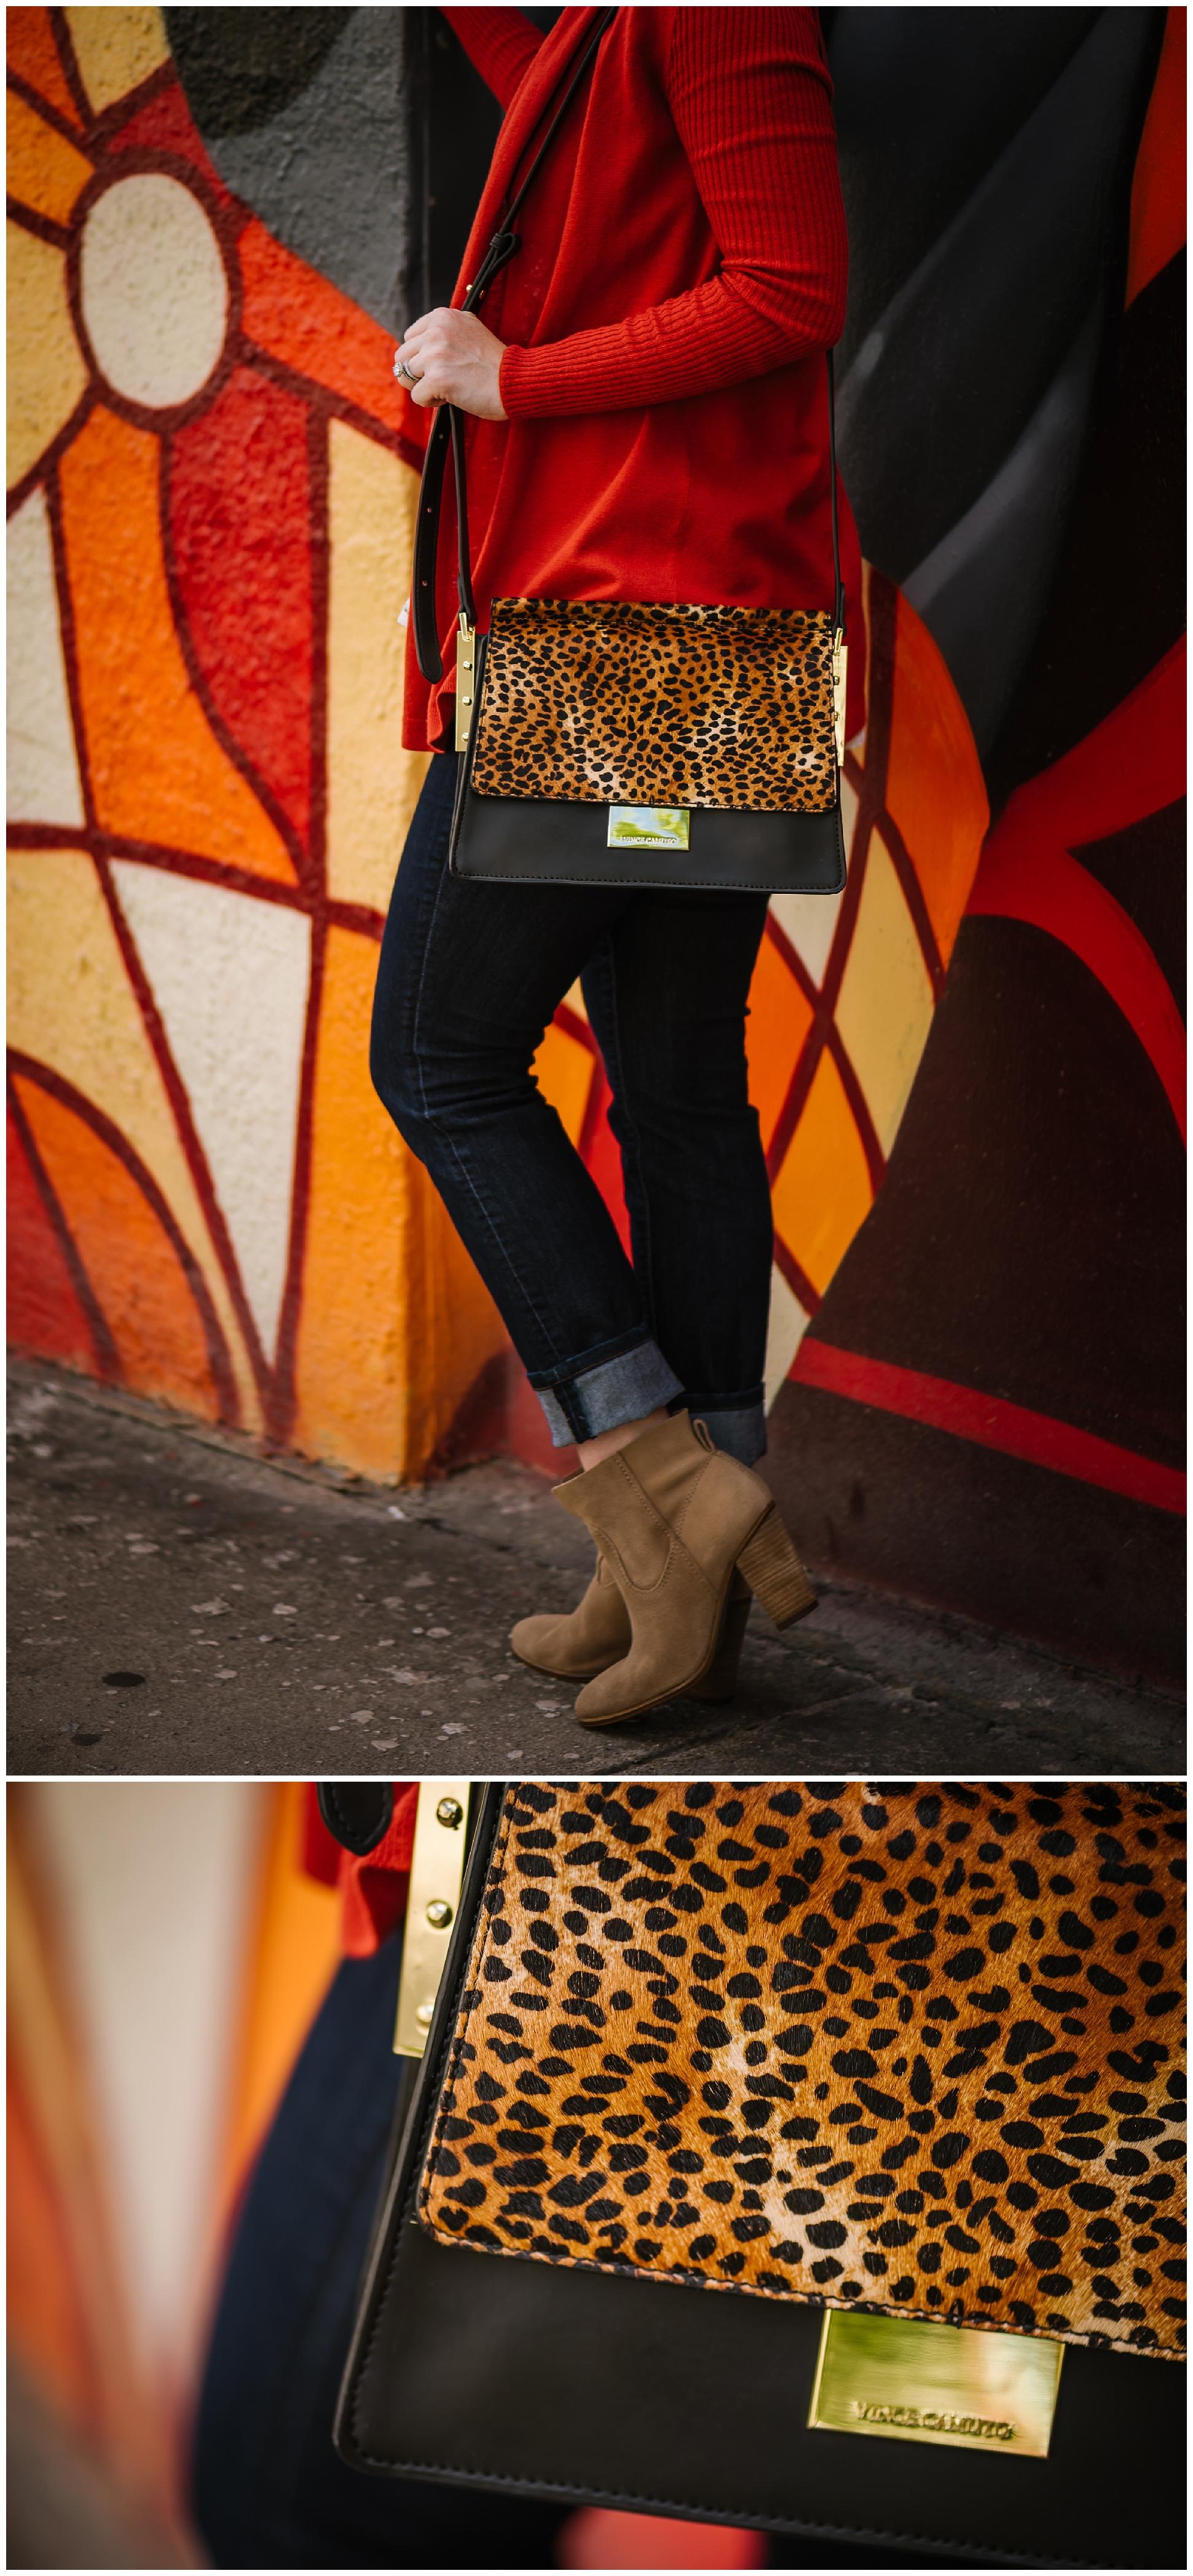 Tampa-lifestyle-bradning-fashion-blogger-photographer_0013.jpg